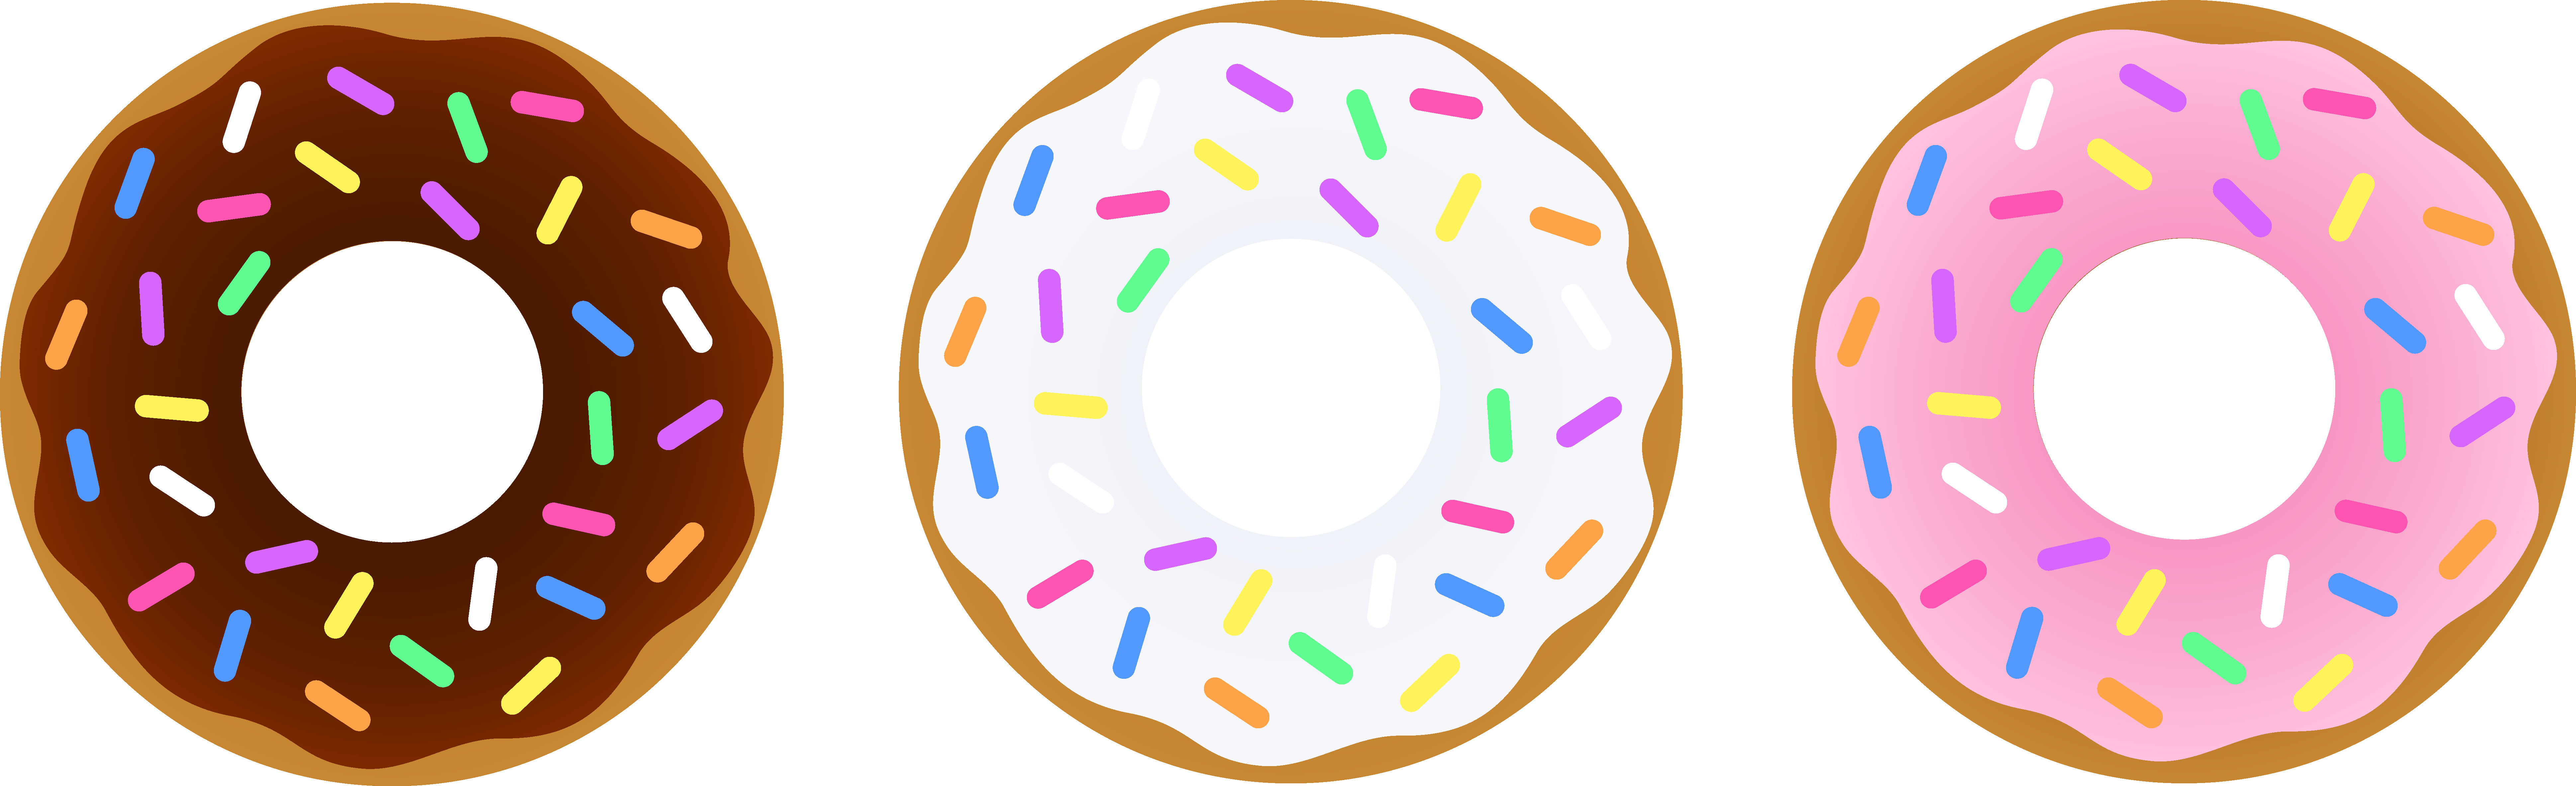 Donut clipart free jpg transparent download Free Donut Cliparts, Download Free Clip Art, Free Clip Art on ... jpg transparent download